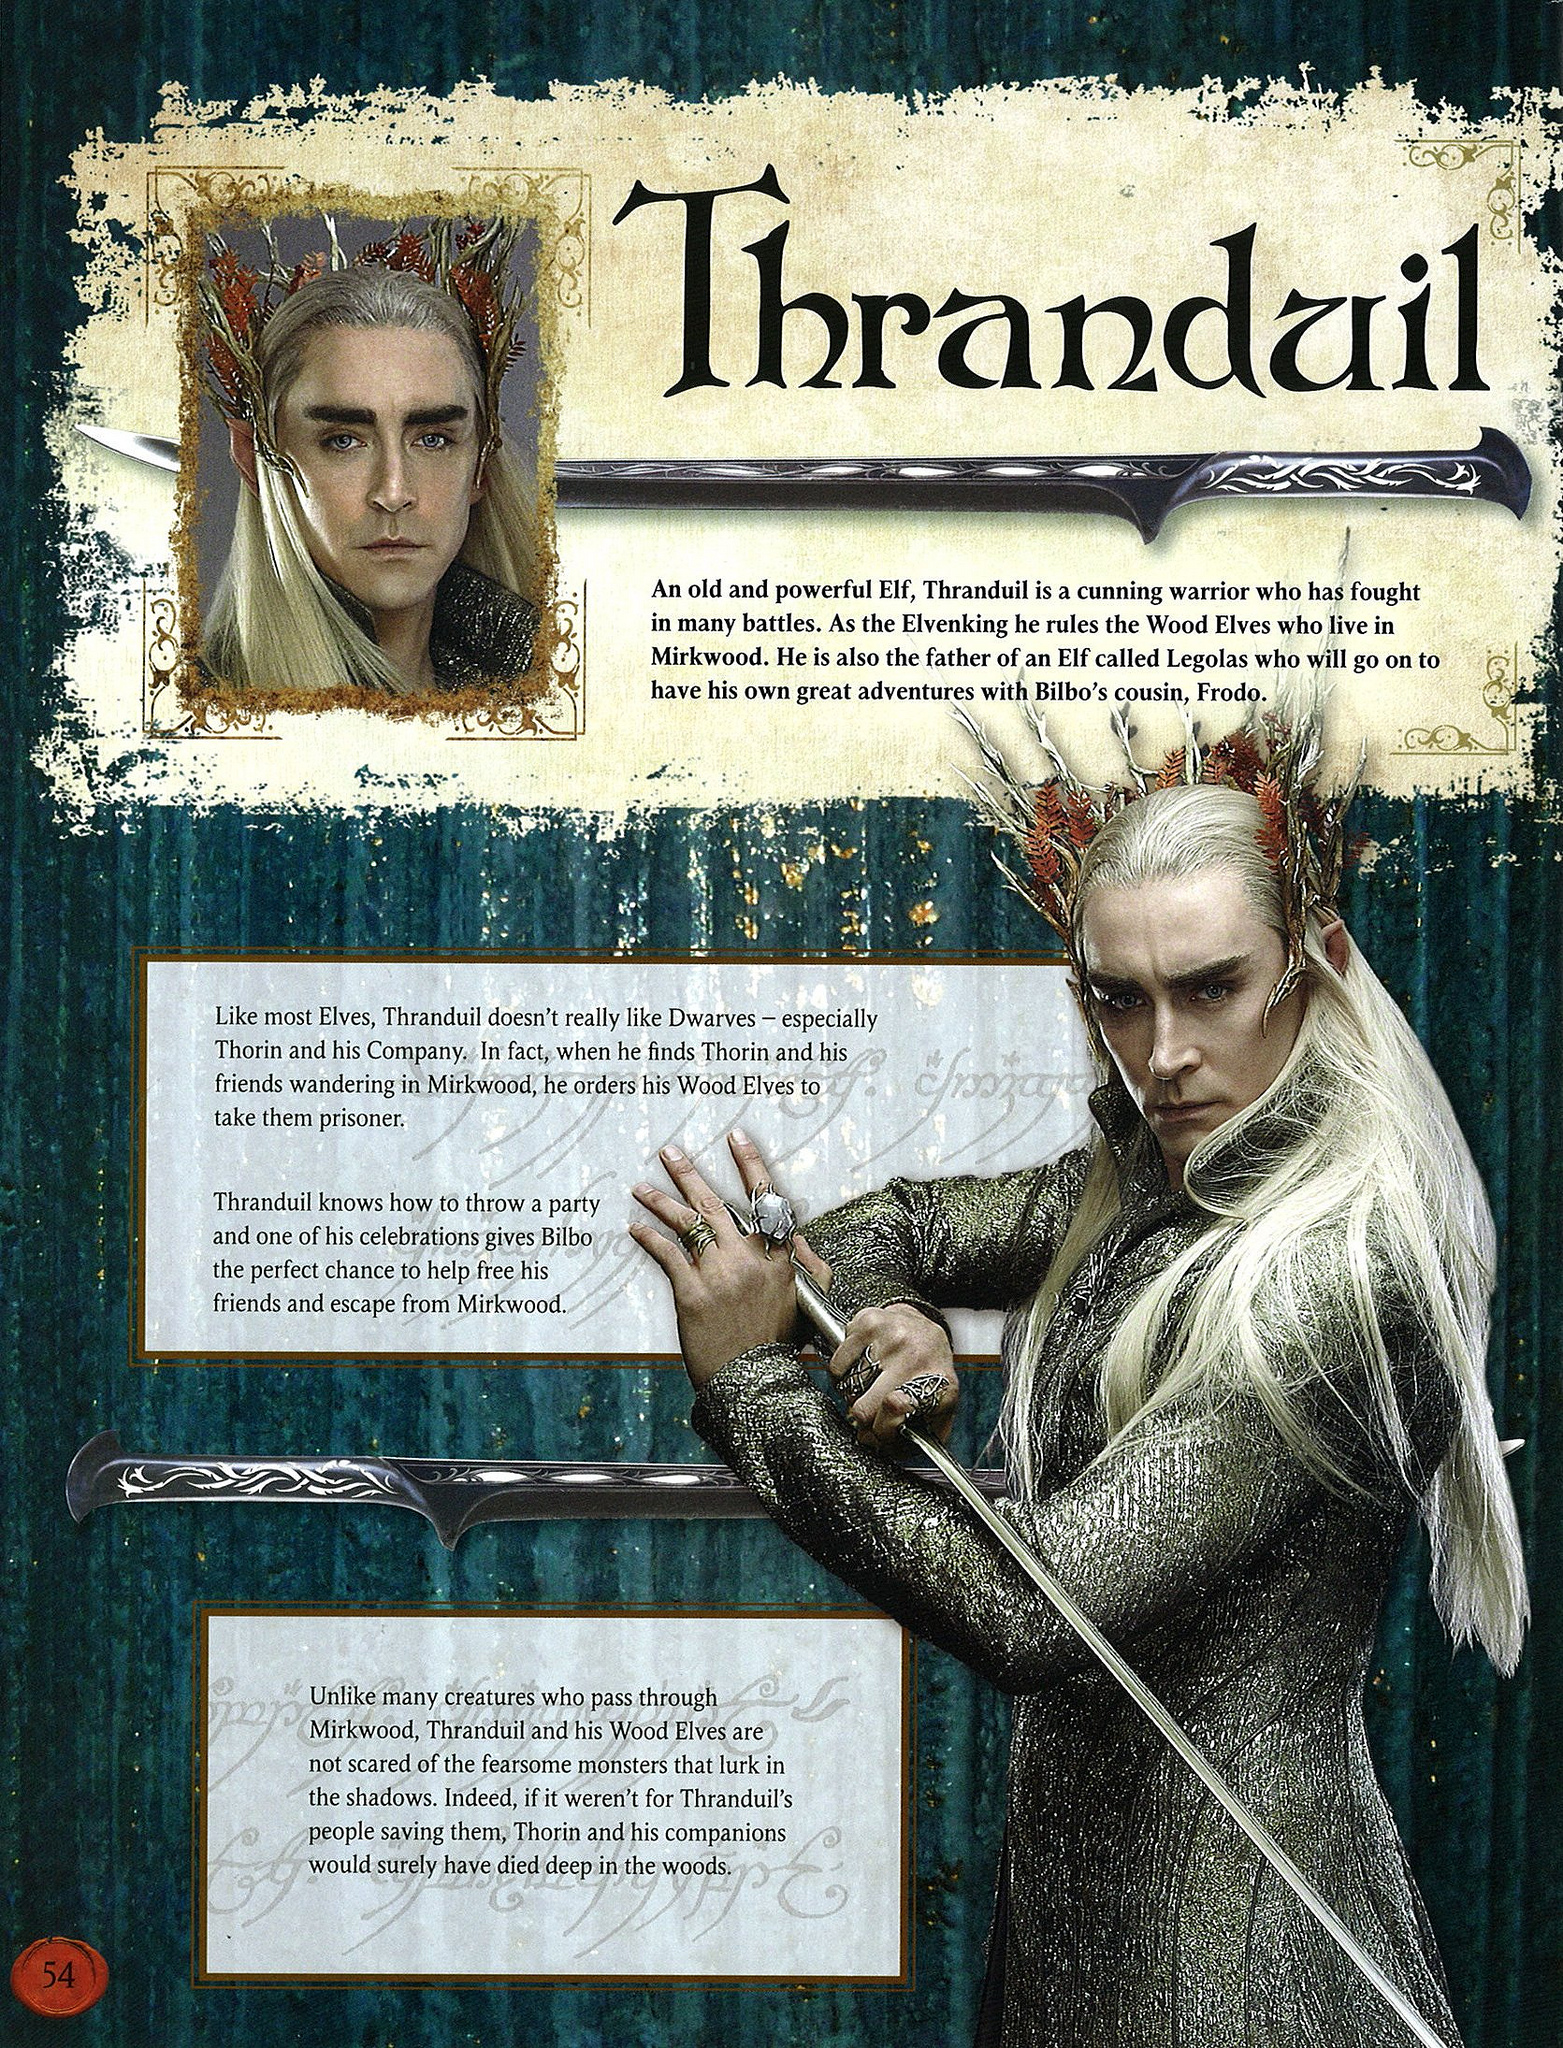 Thranduil Saruman the White Revealed In Hobbit Film Tie In 1563x2048